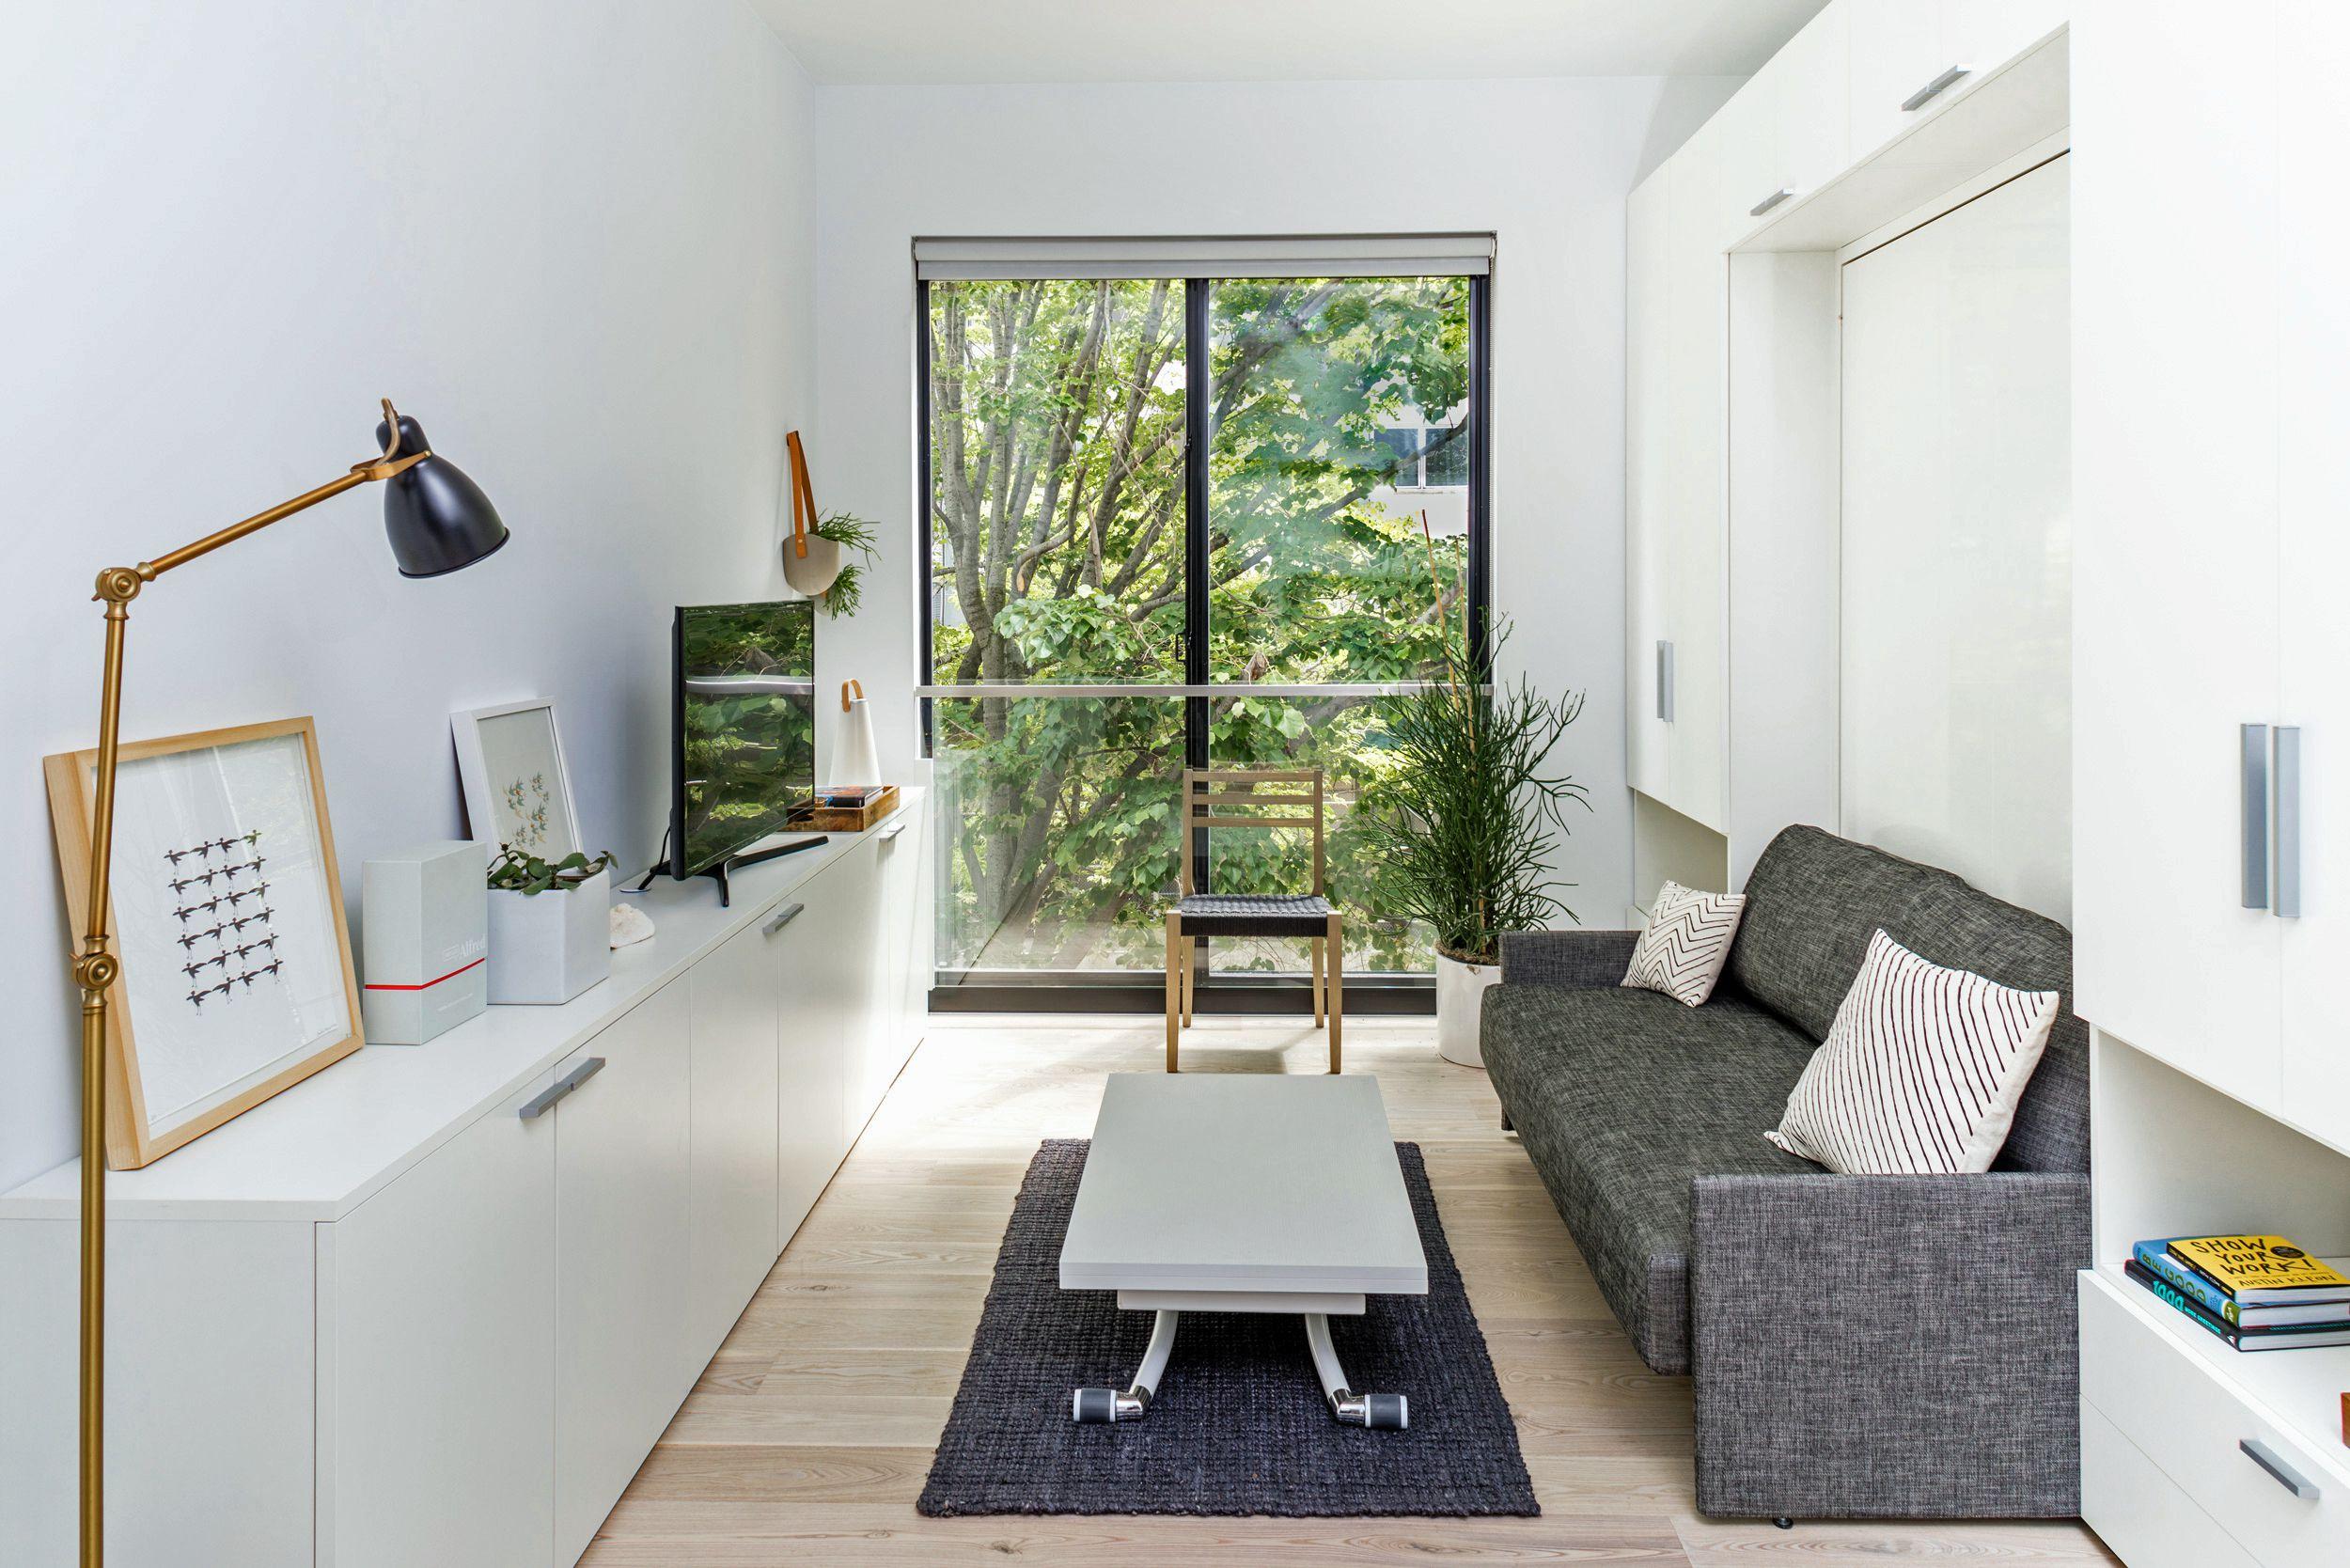 studio apartment living.  12 Perfect Studio Apartment Layouts That Work